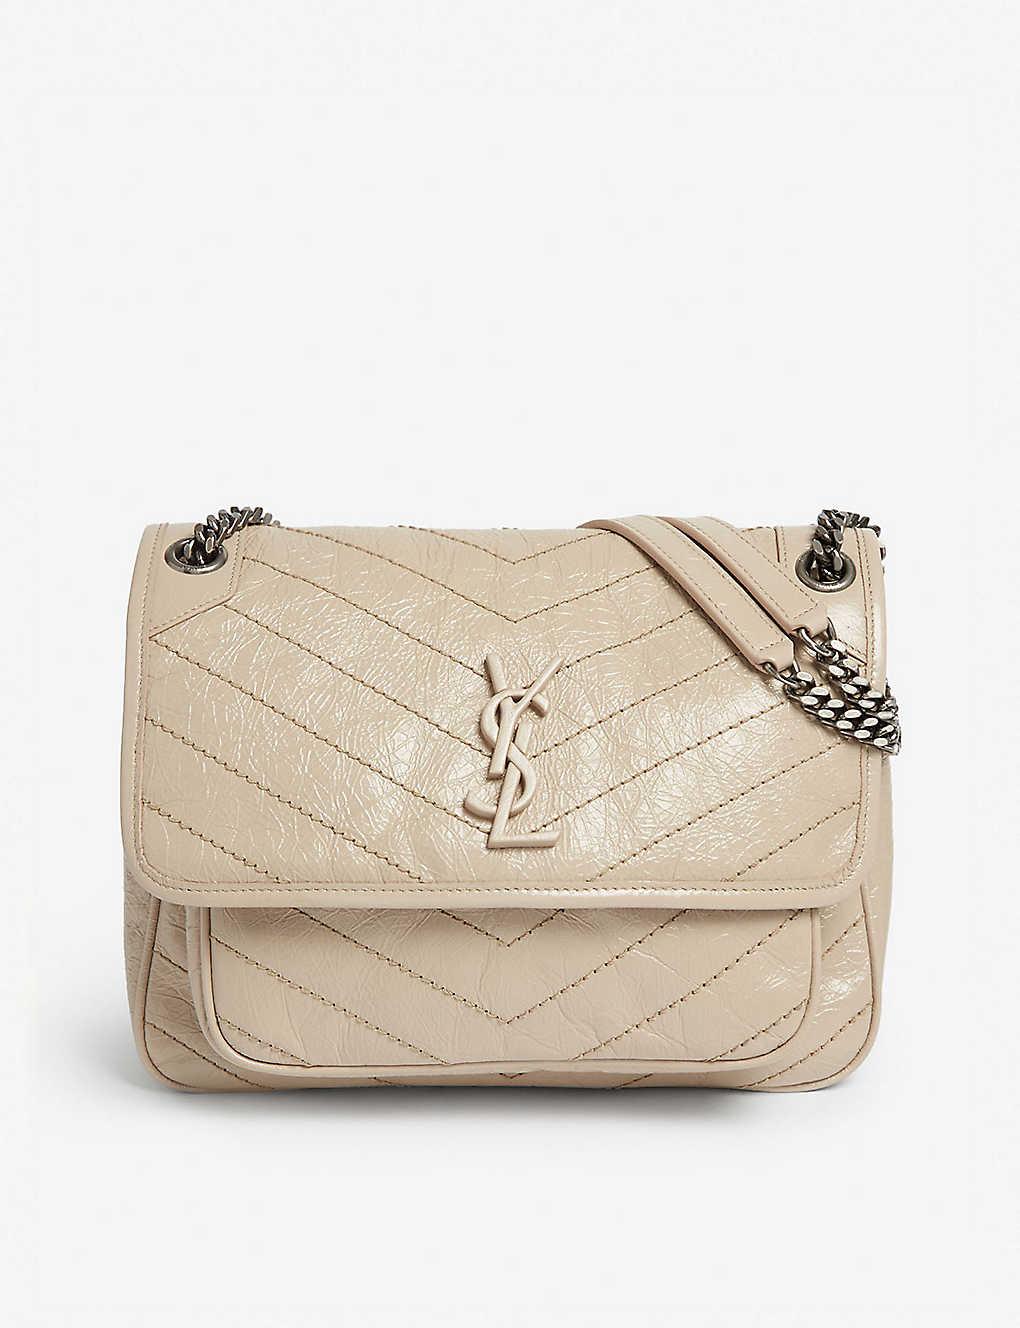 5c2ed0fcf39 SAINT LAURENT - Niki medium leather shoulder bag